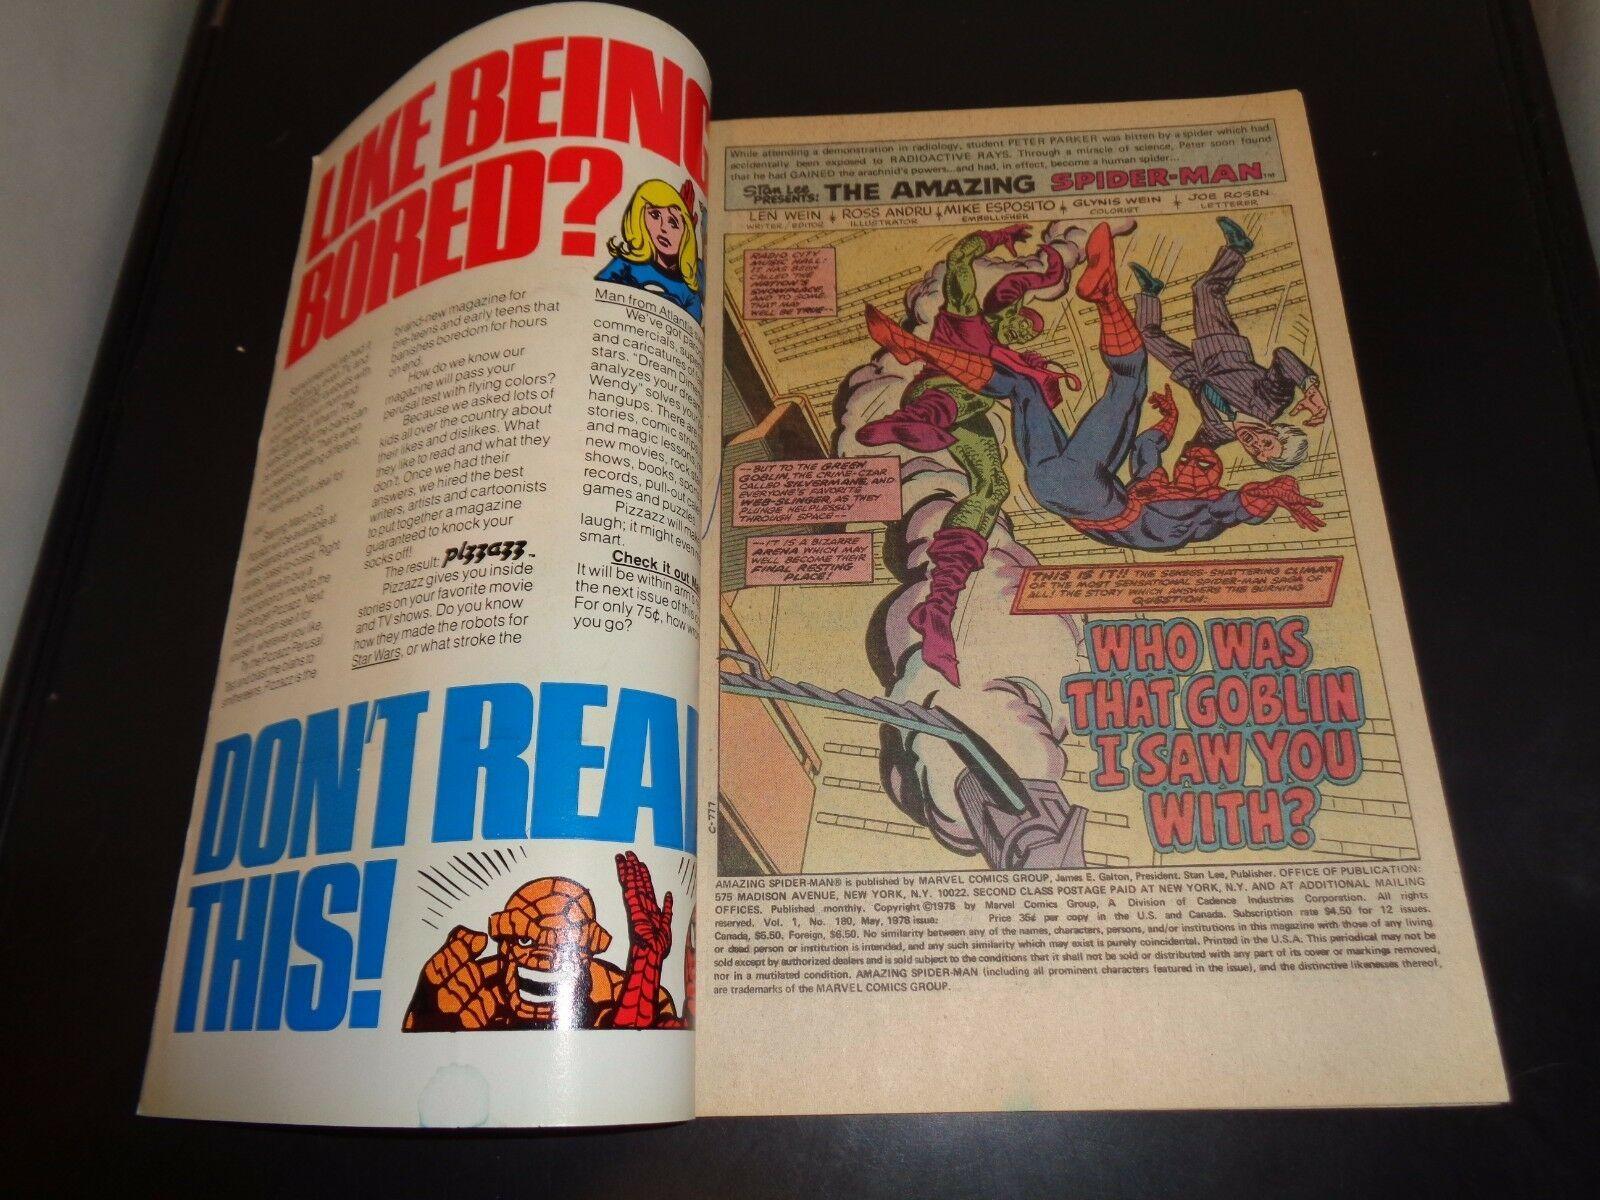 Amazing Spider-Man #180 Marvel Comic Book FN (7.0) Condition 1978 Green Goblin